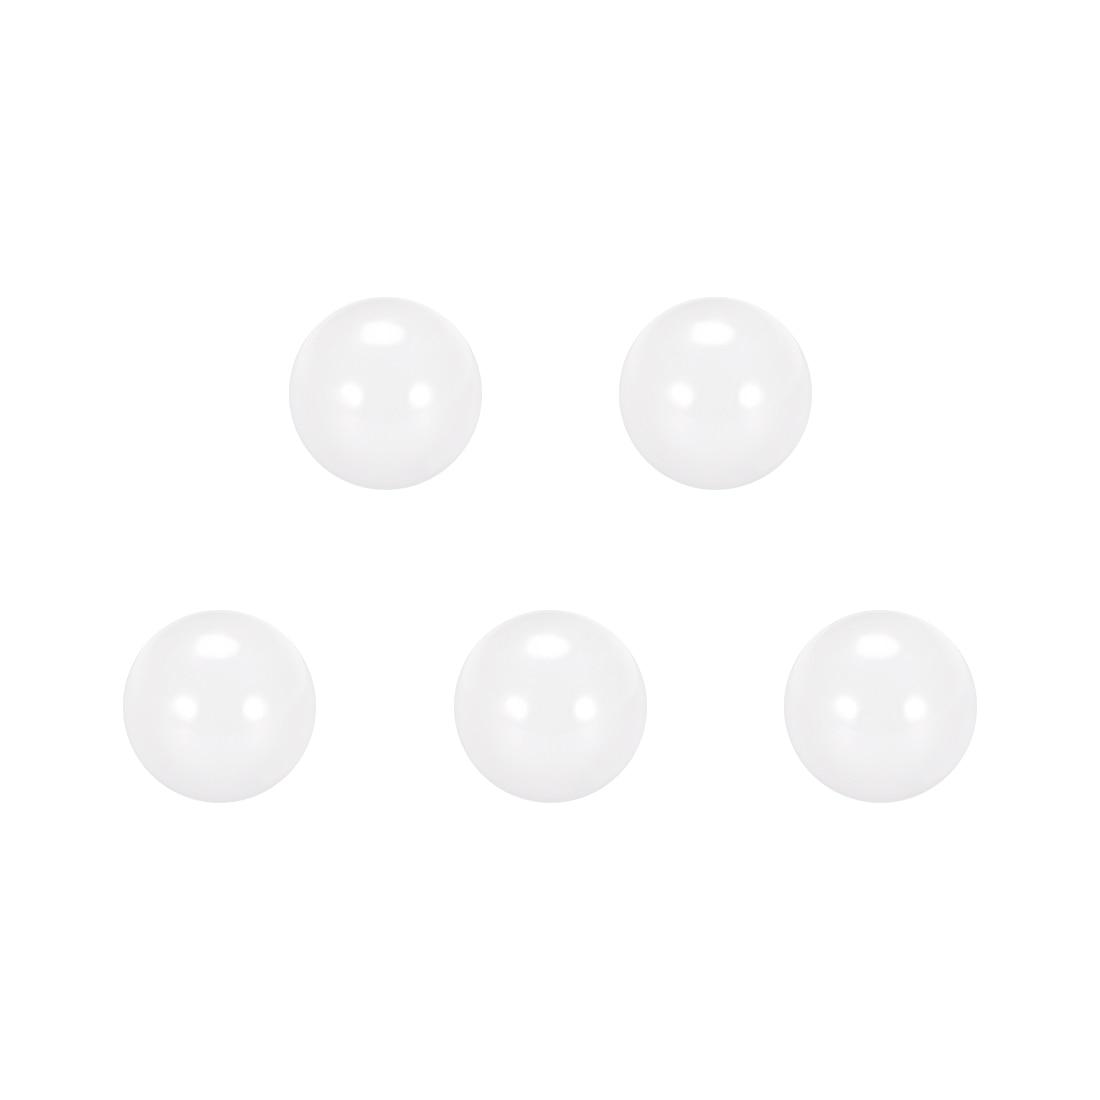 uxcell 3//16 inches Ceramic Bearing Balls ZRO2 Zirconium Oxide Ball G5 Precision 5pcs